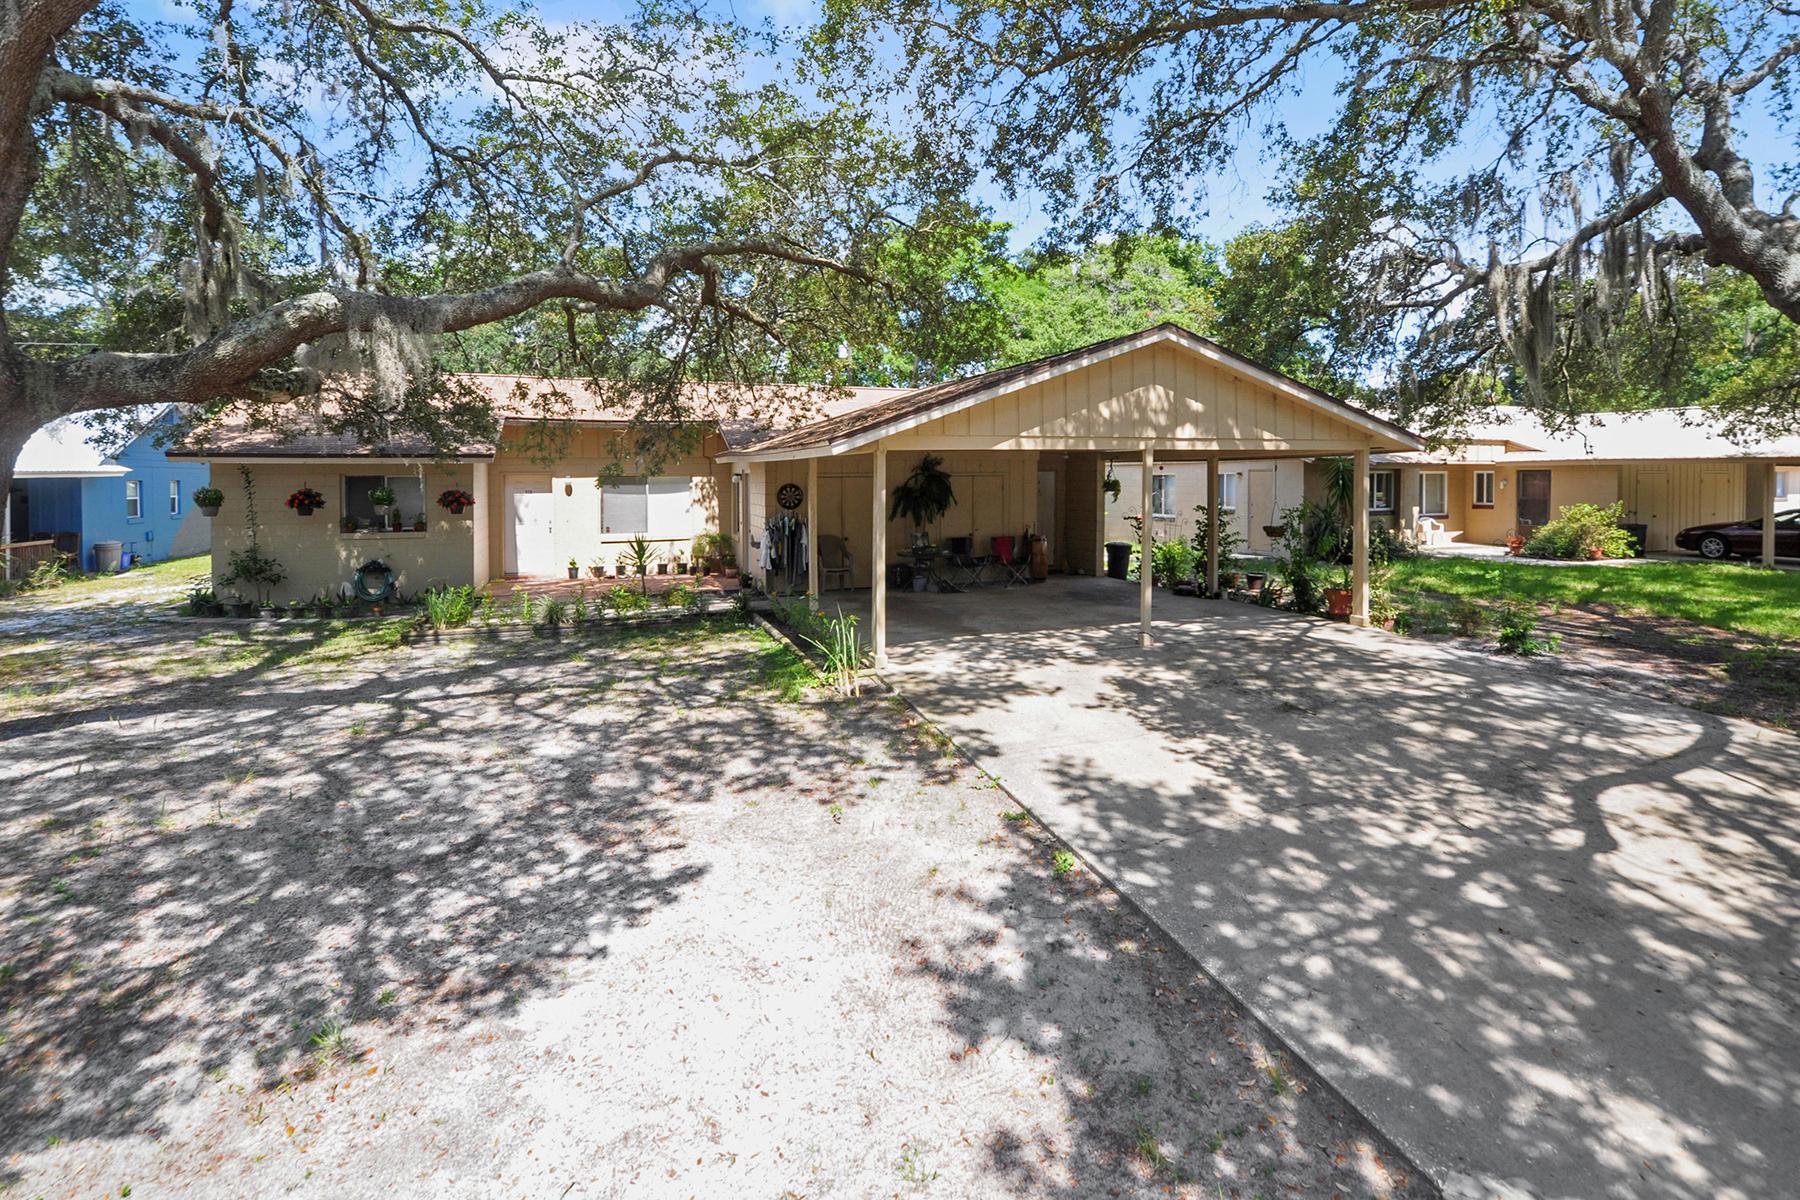 Multi-Family Home for Sale at ORLANDO - ALTAMONTE SPRINGS 516518 Camino Ct Altamonte Springs, Florida, 32701 United States